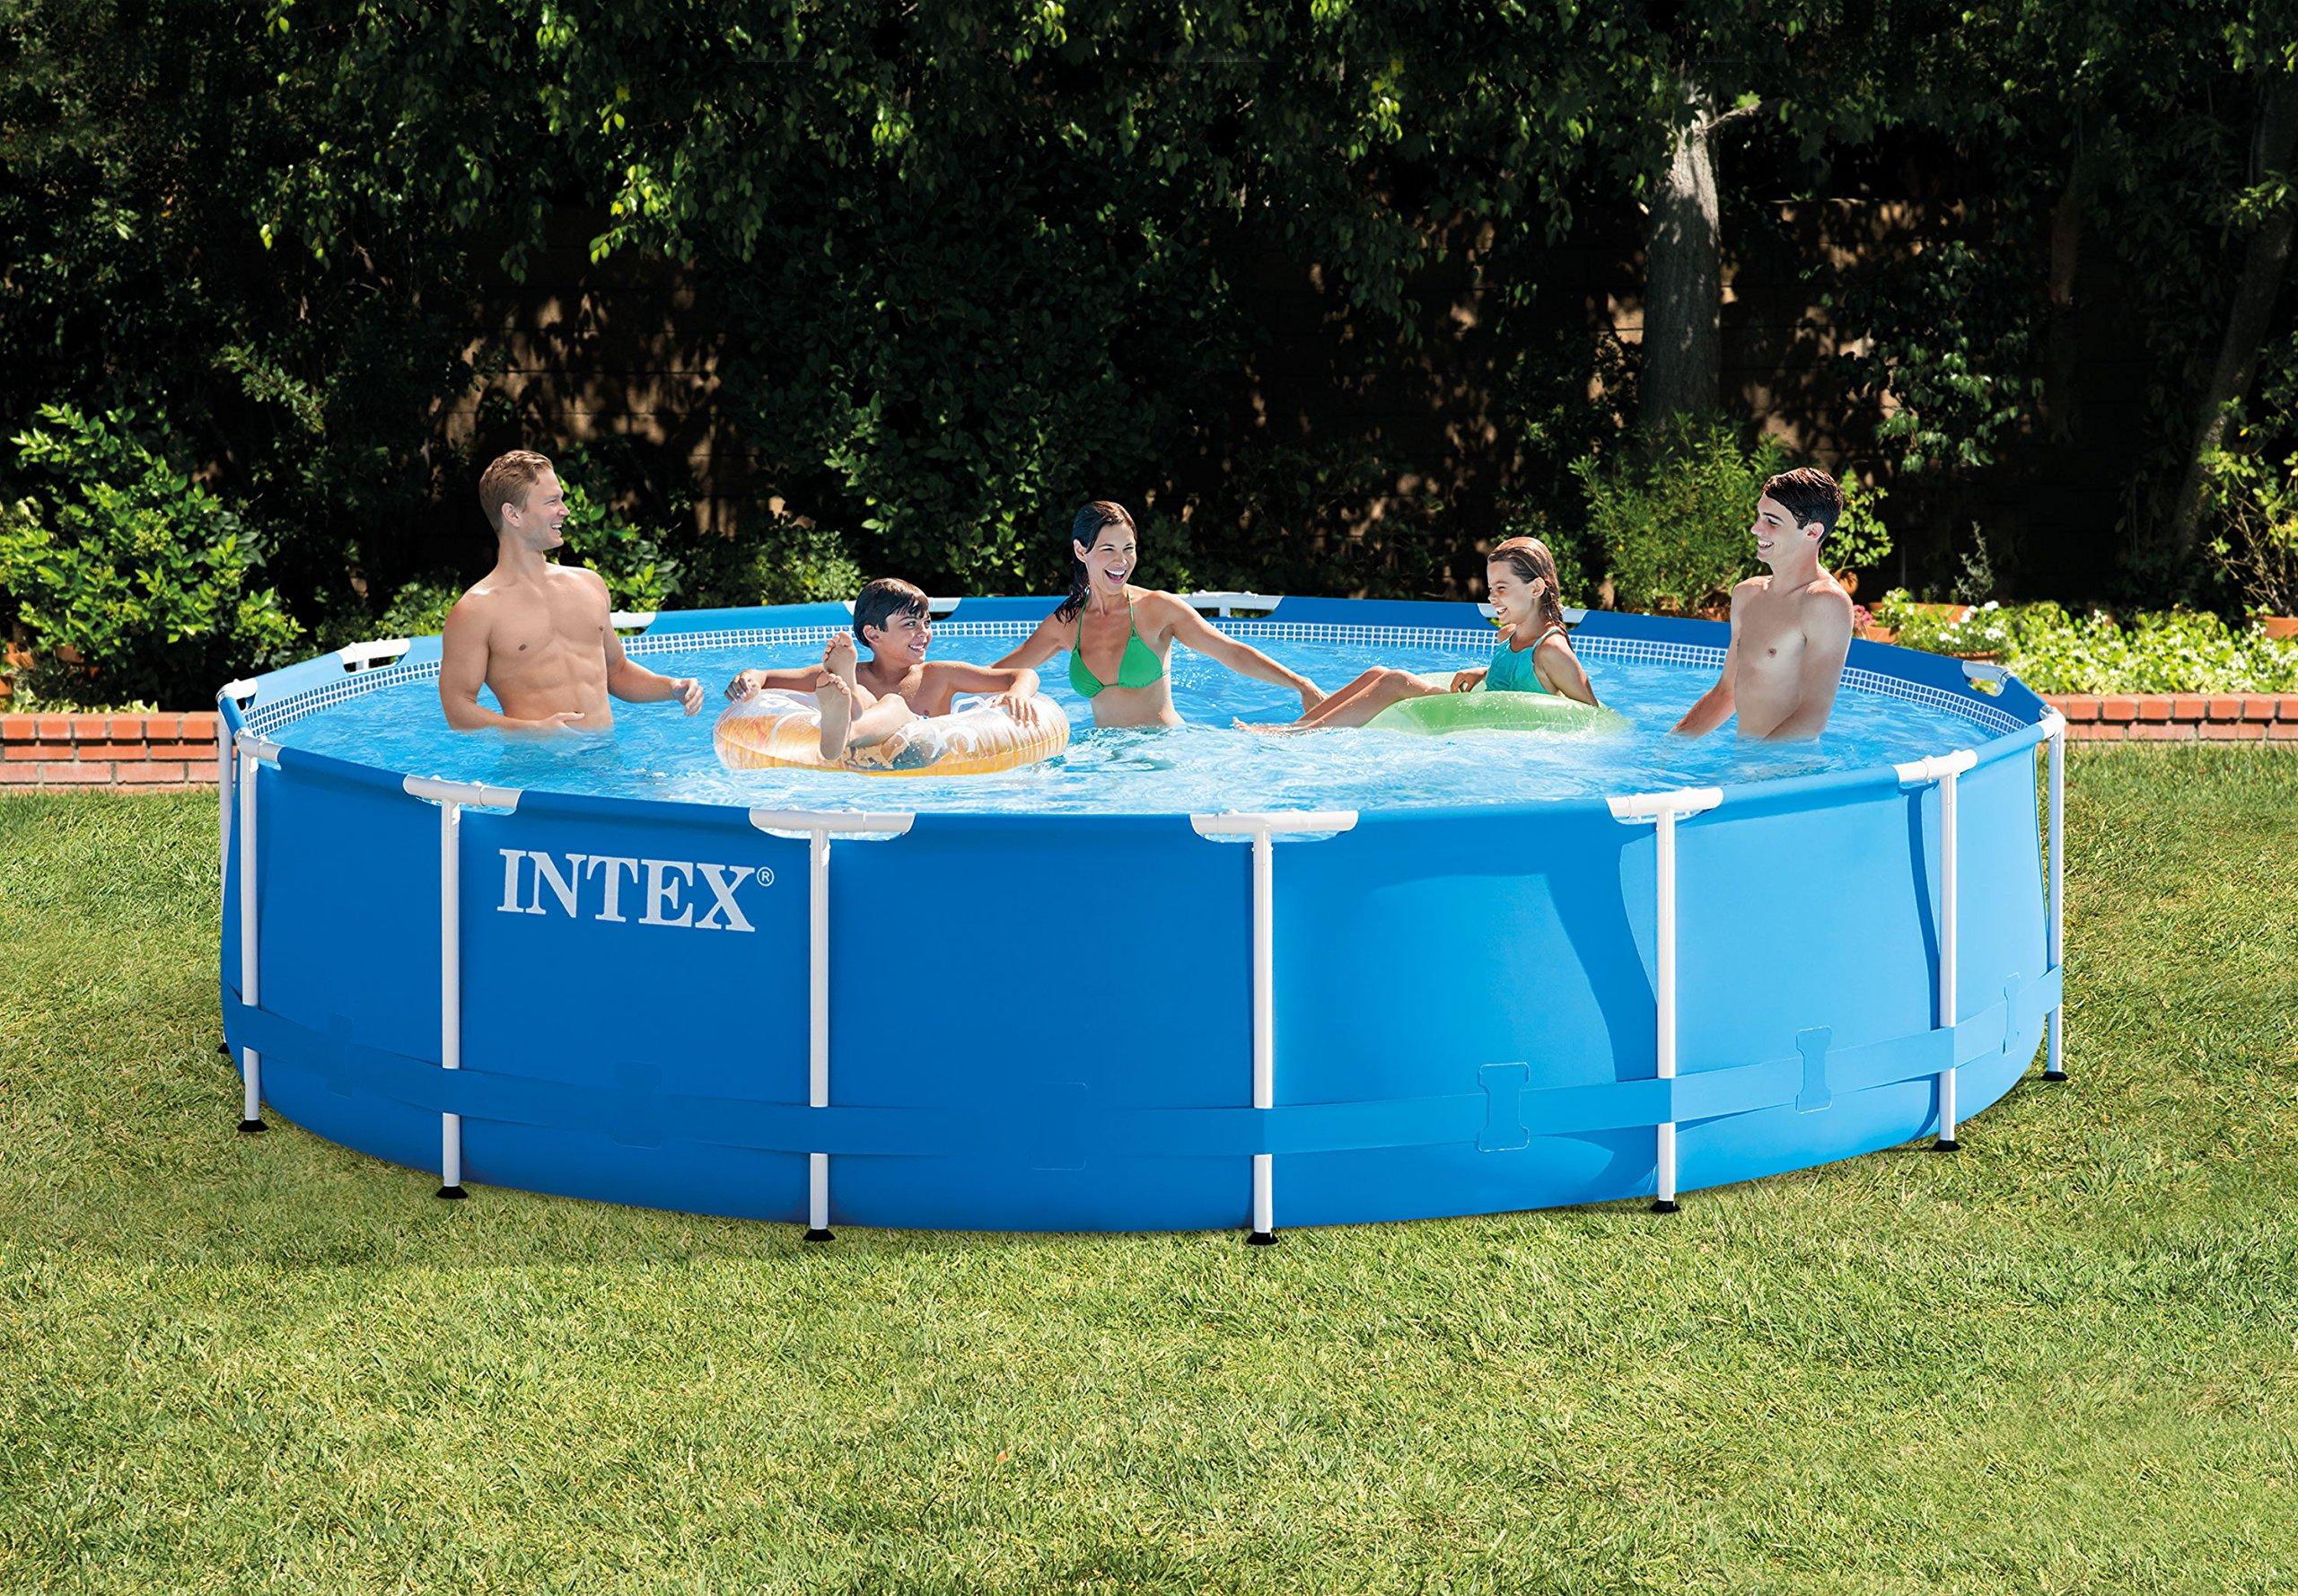 Intex Metal Frame Pool Set - Piscina, 457 x 84 cm, Color Azul ...